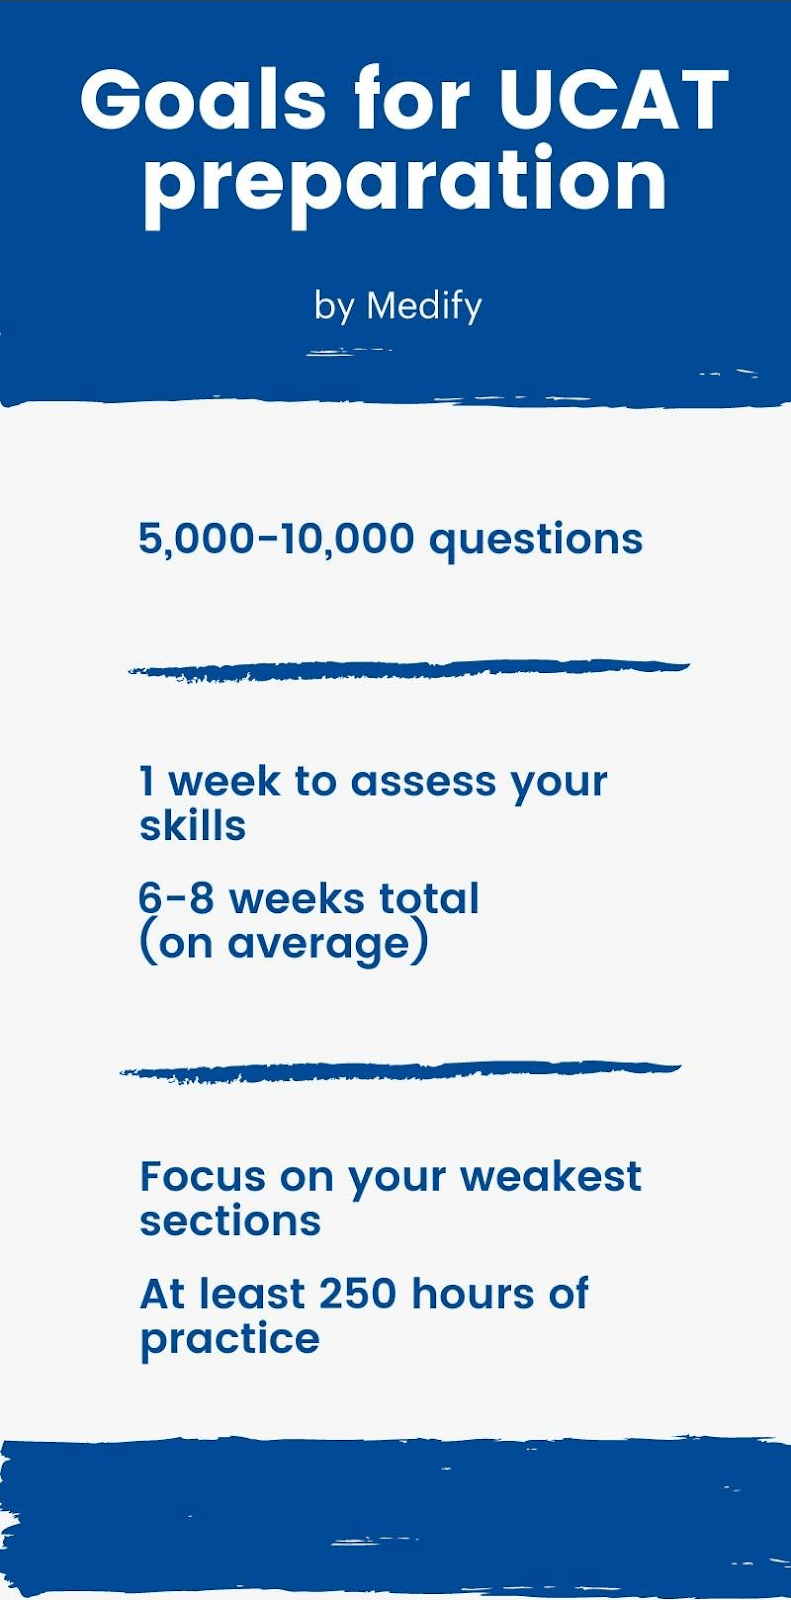 Goals for UCAT preparation infographic.